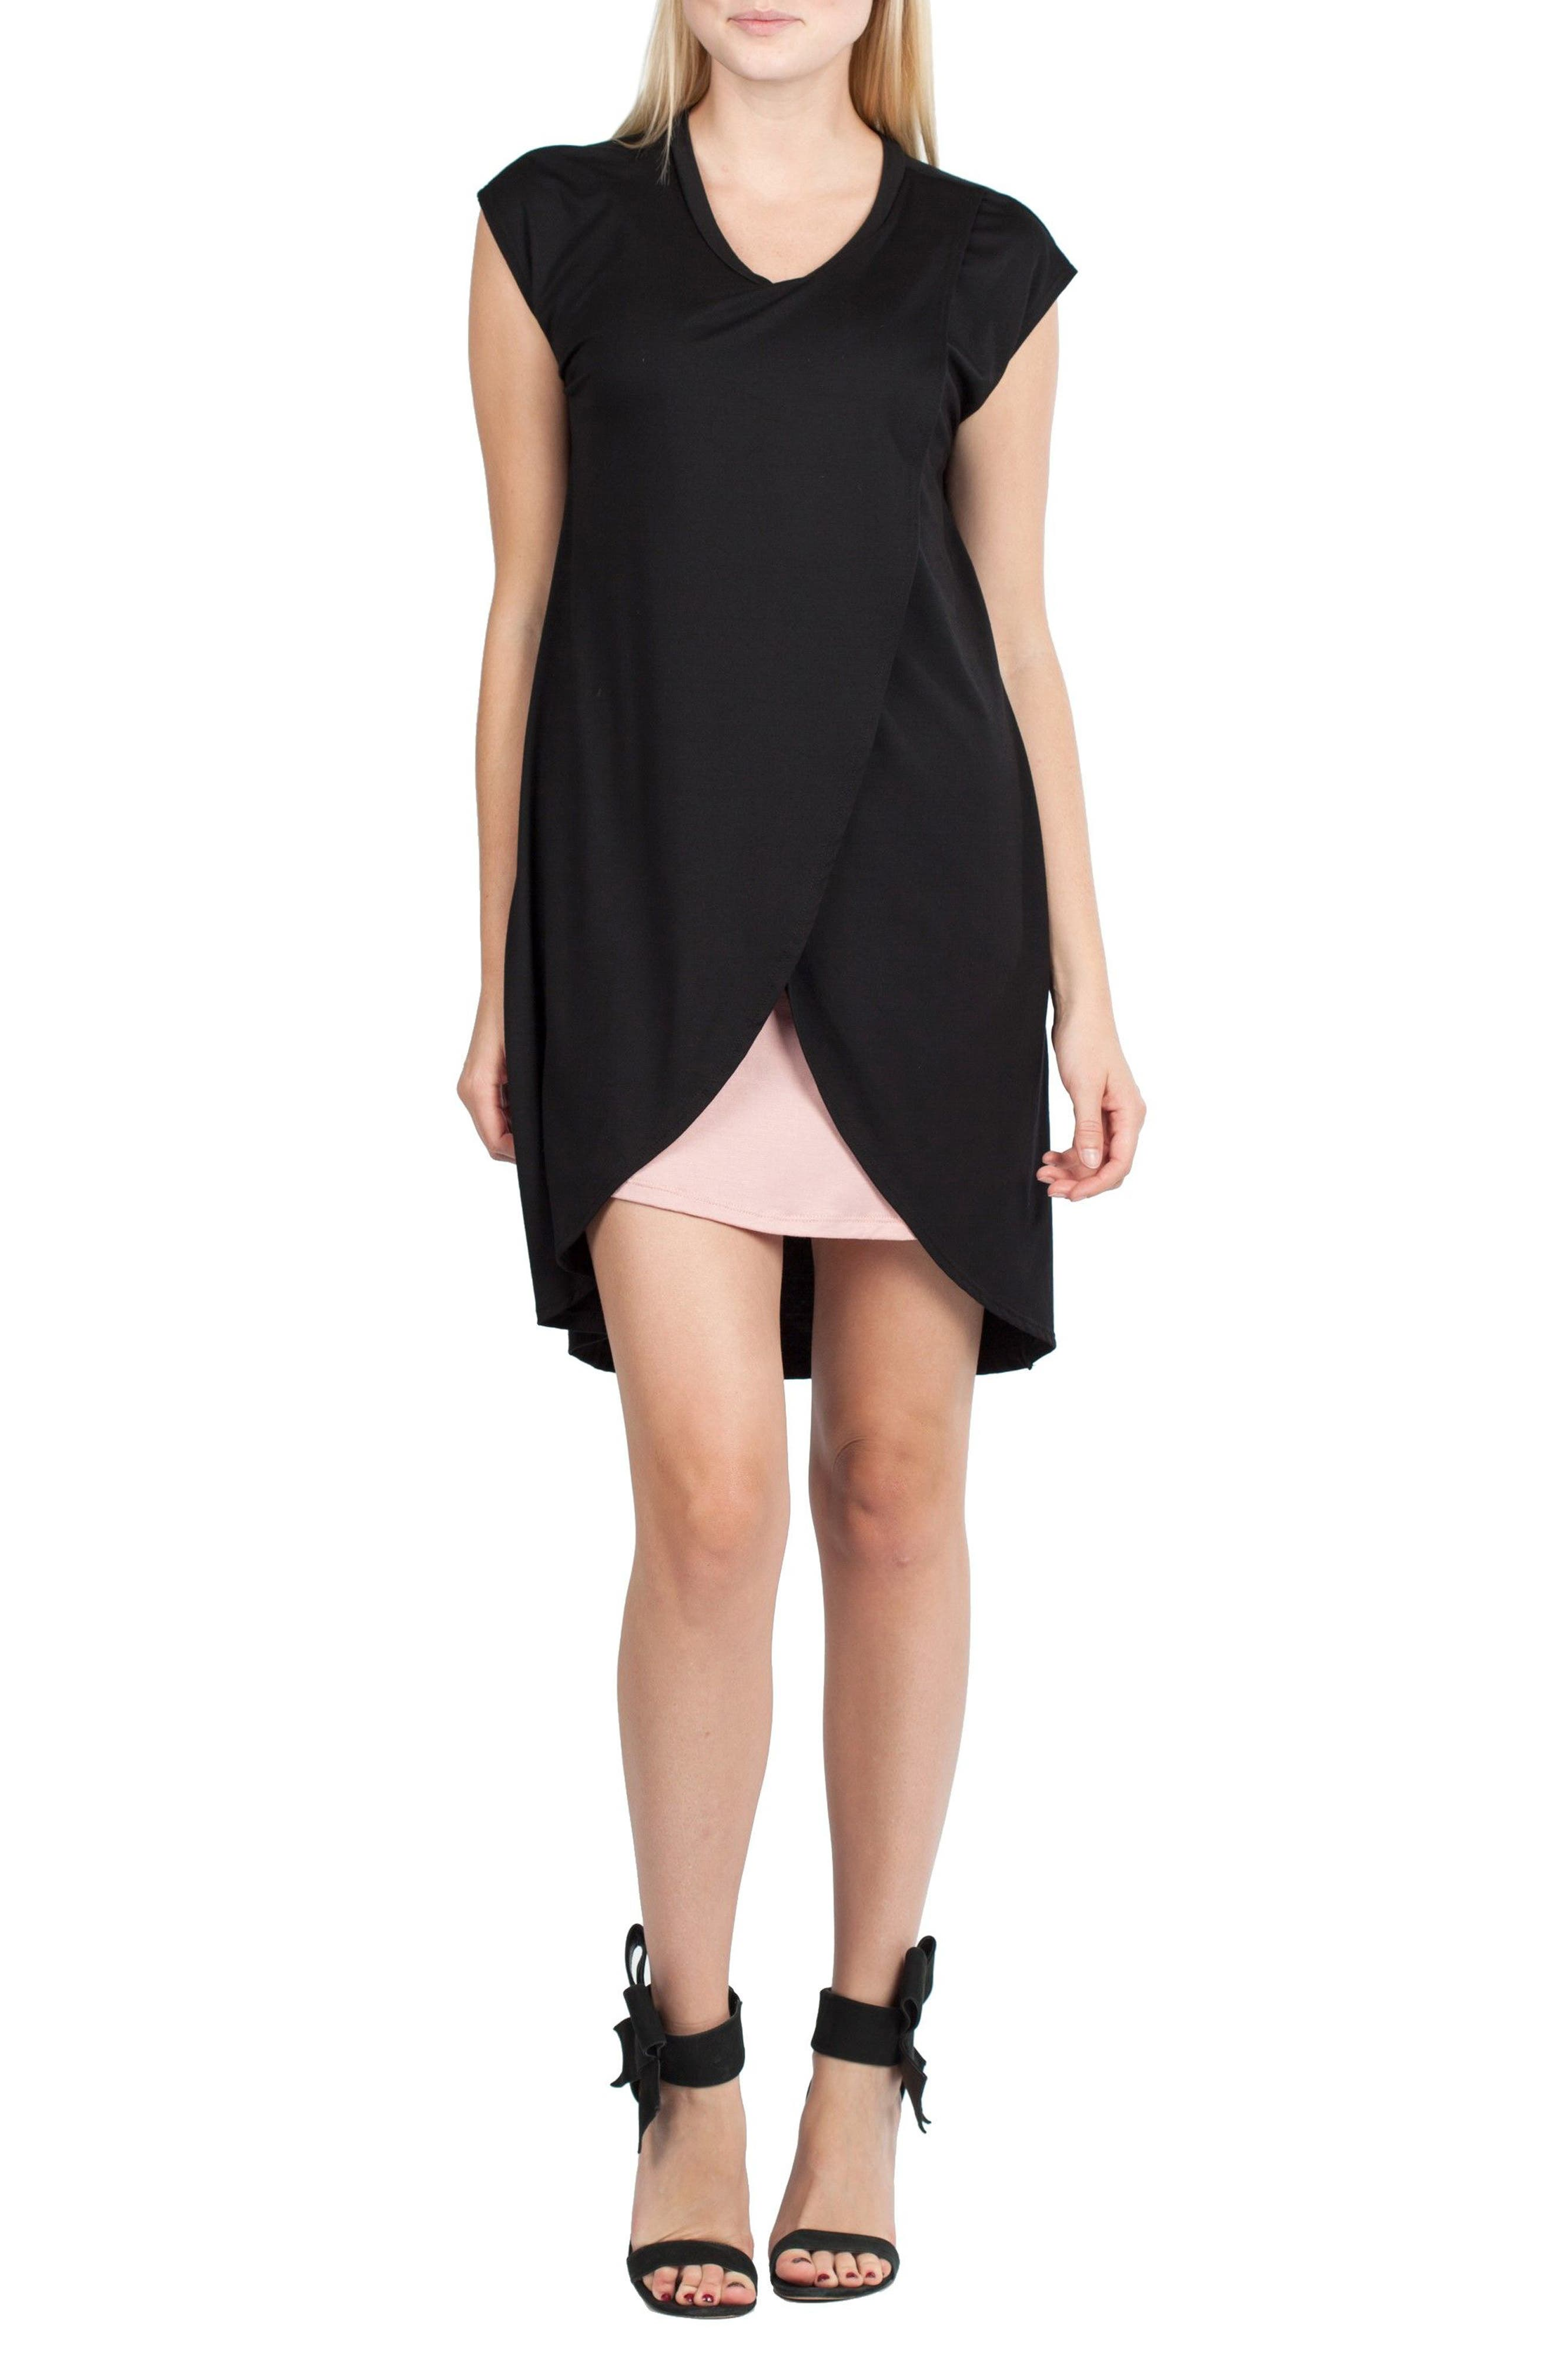 SAVI MOM Lille Maternity/Nursing Tunic Dress, Main, color, BLACK/ DUSTY PINK CONTRAST